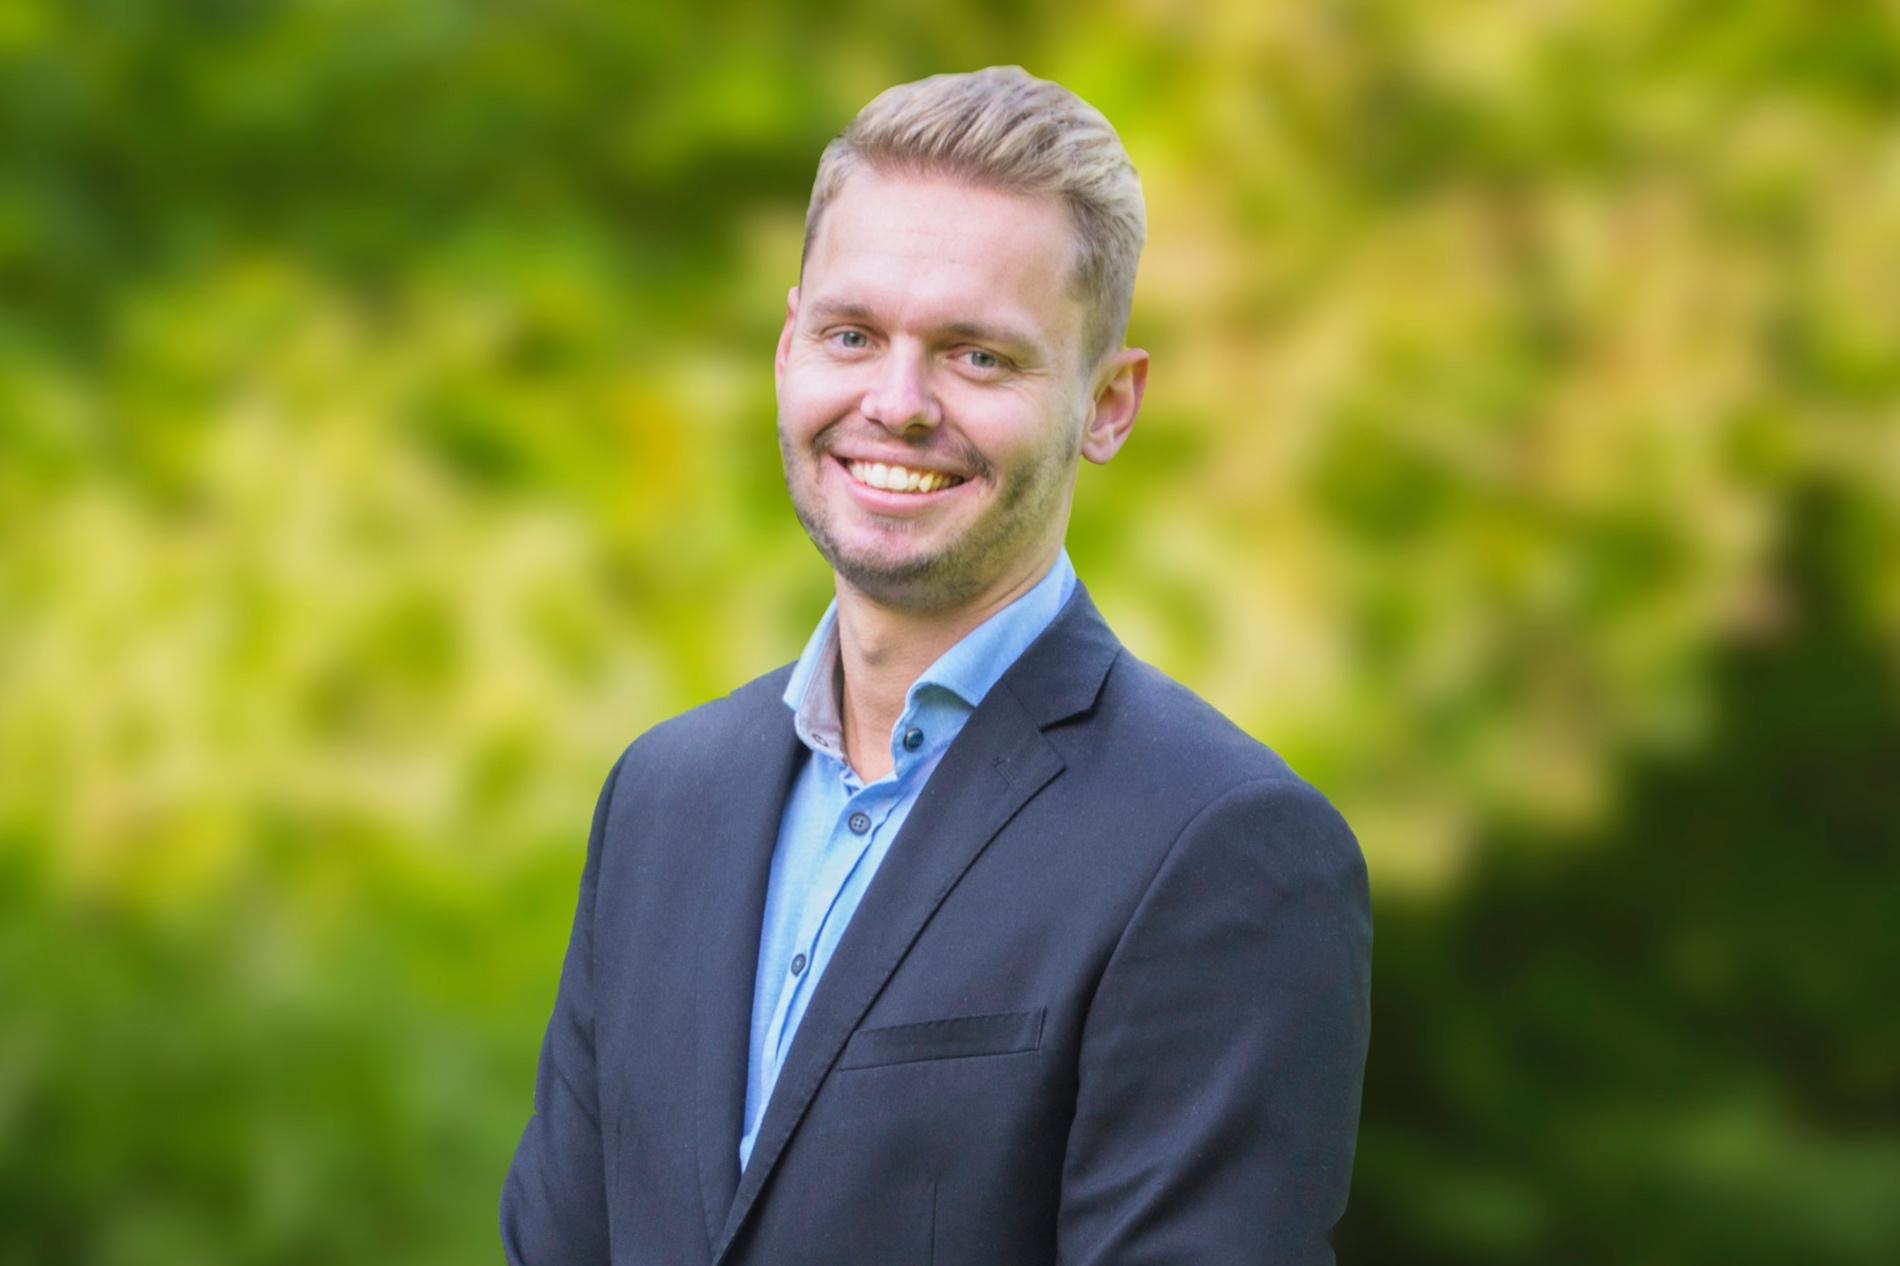 Arjan Postma (MSc) HEOR Consultant Expertise: Orphan drugs, vaccines, market access and reimbursement